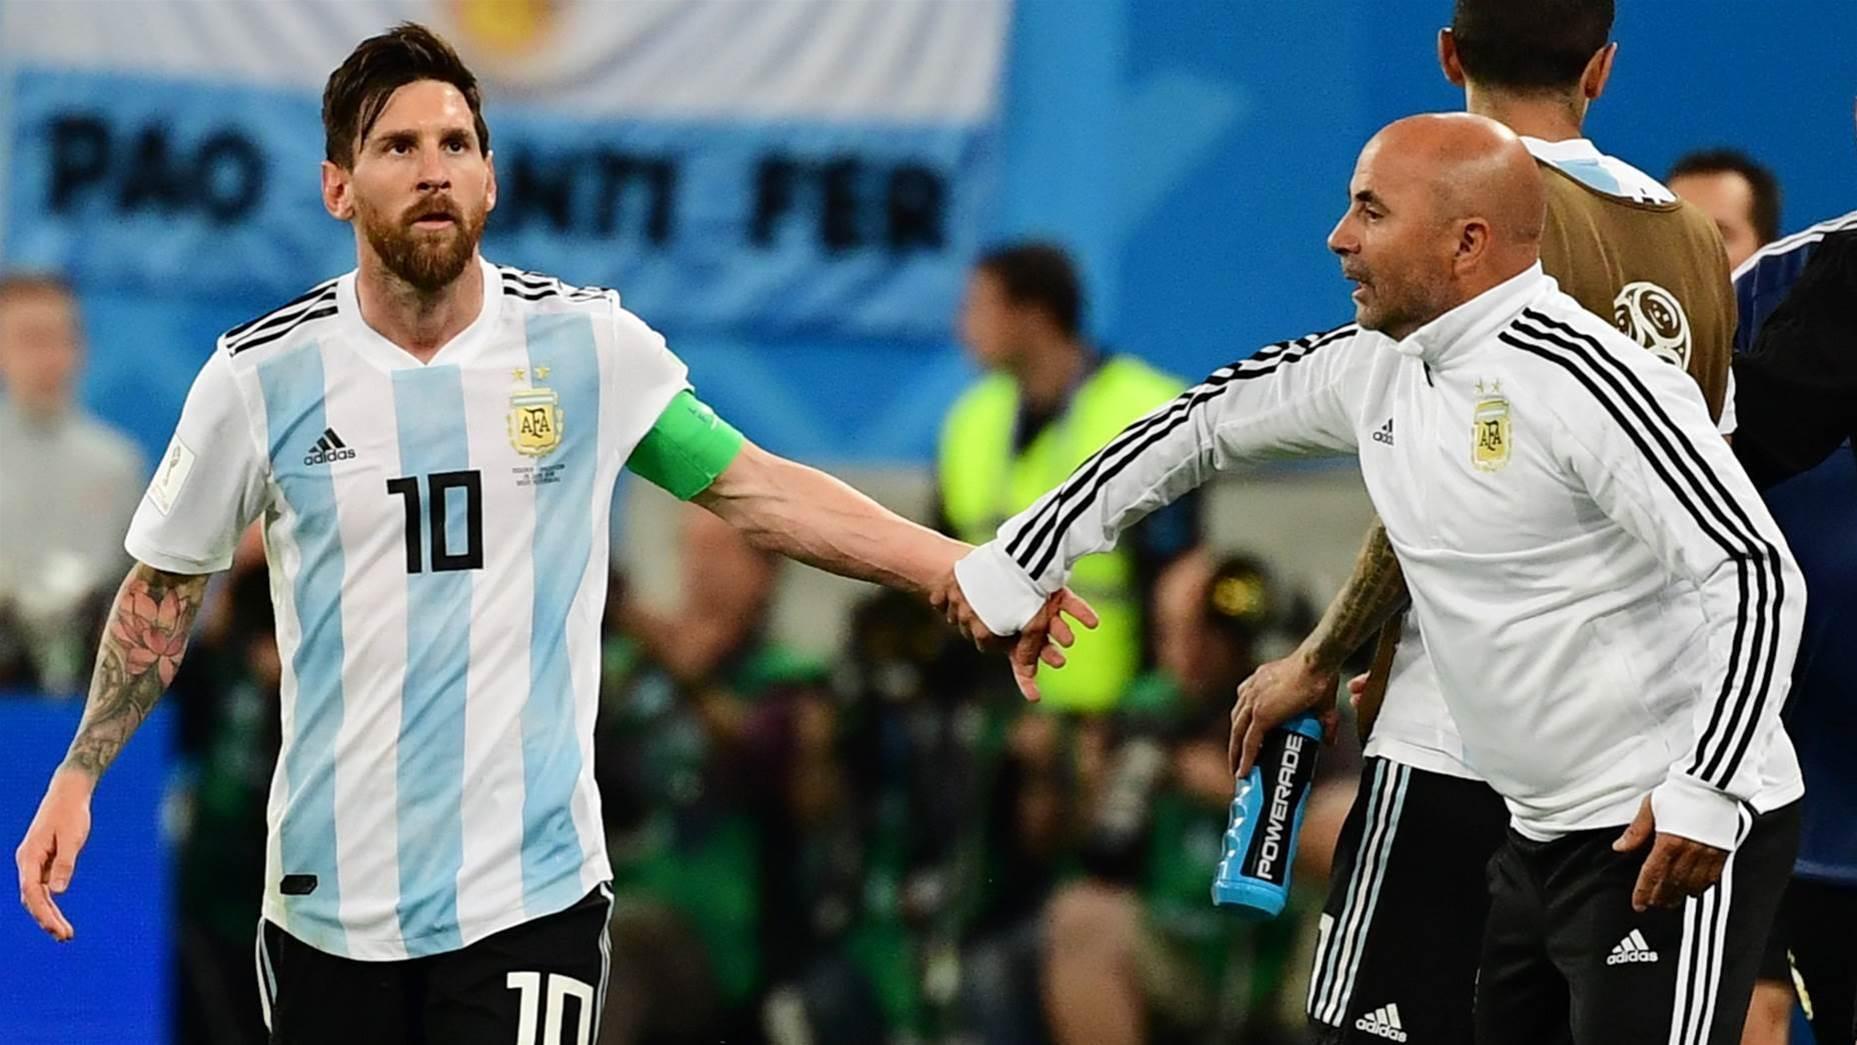 Sampaoli 'asked Messi' for advice on Aguero sub